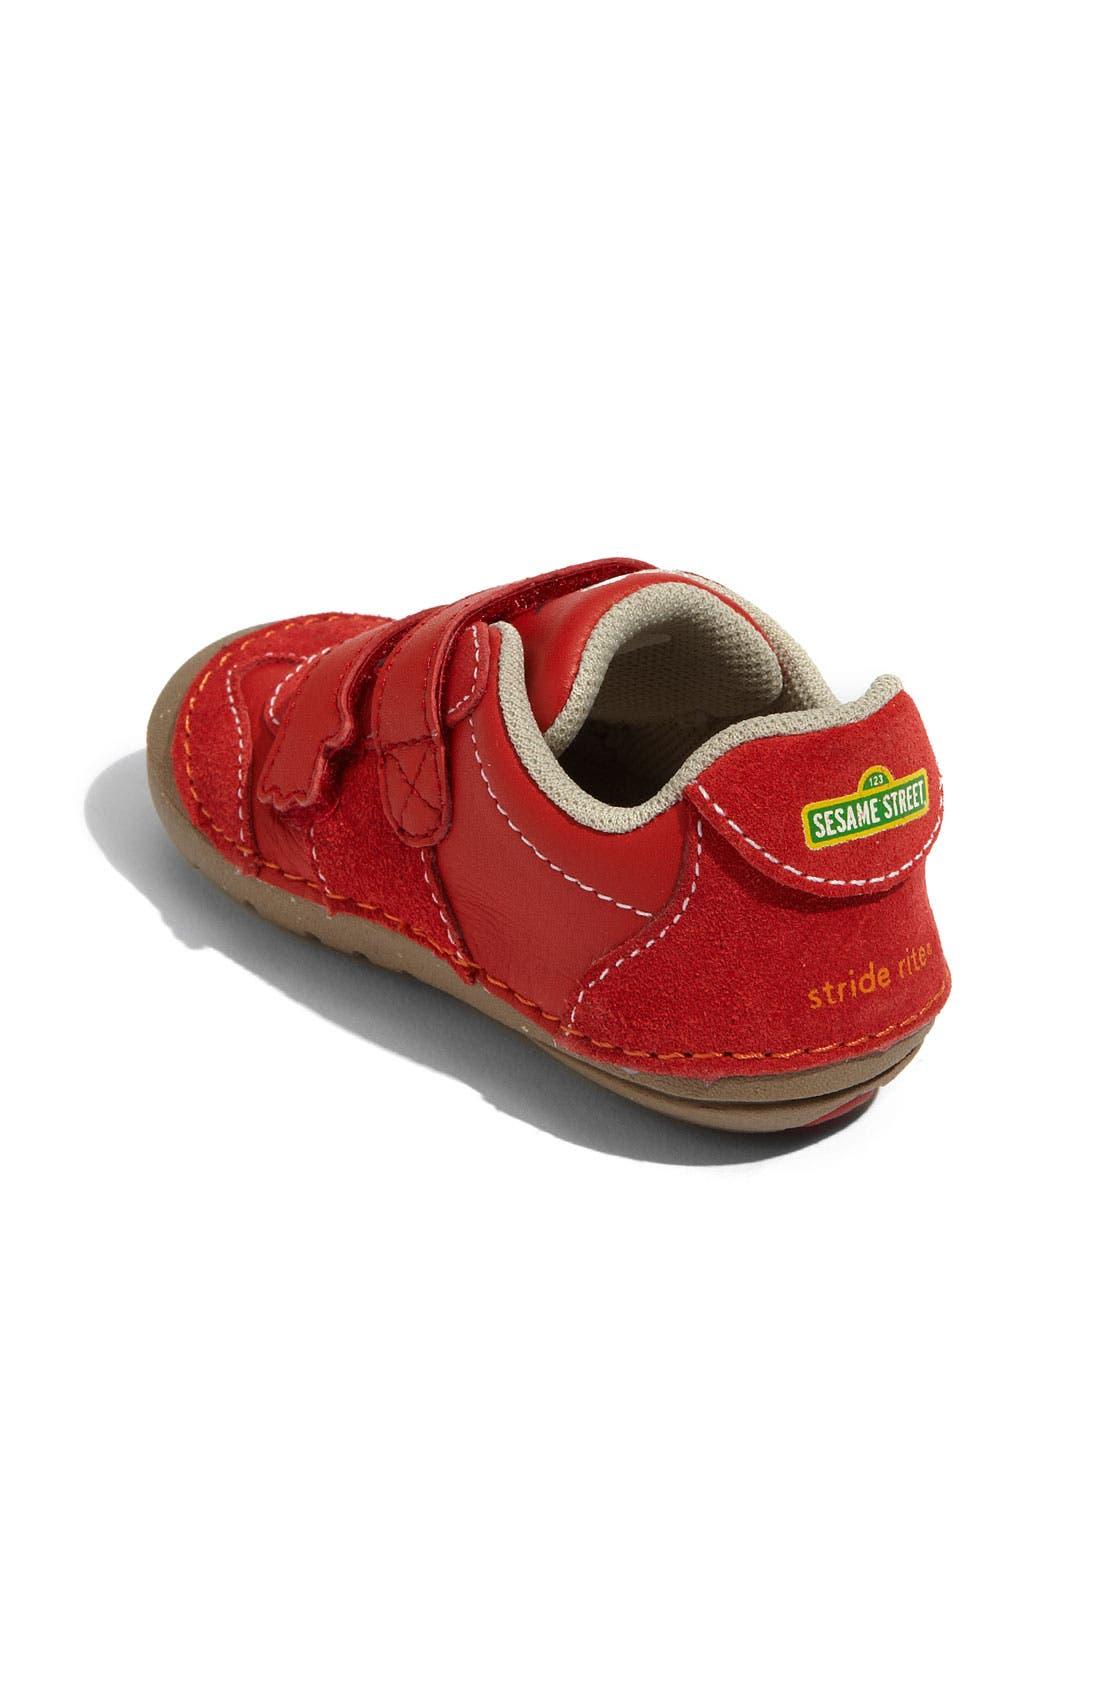 'Sesame Street<sup>®</sup> - Elmo' Sneaker,                             Alternate thumbnail 4, color,                             600